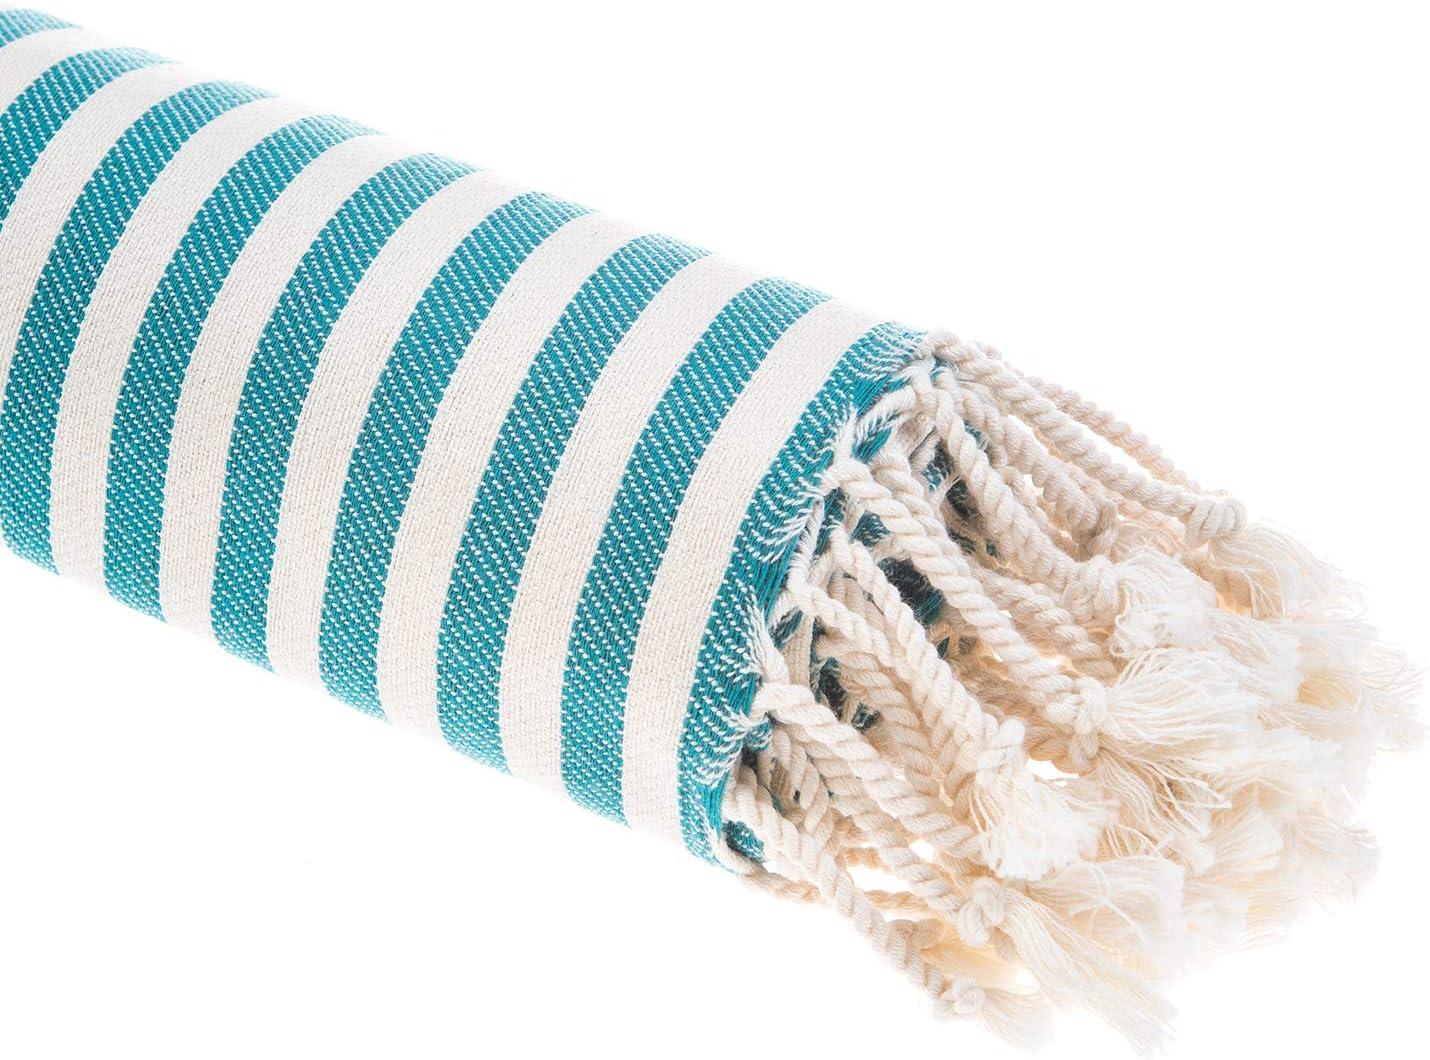 Ocean Blue Striped 180 x 90 x 1 cm Asciugamano Turco per hammam KZY